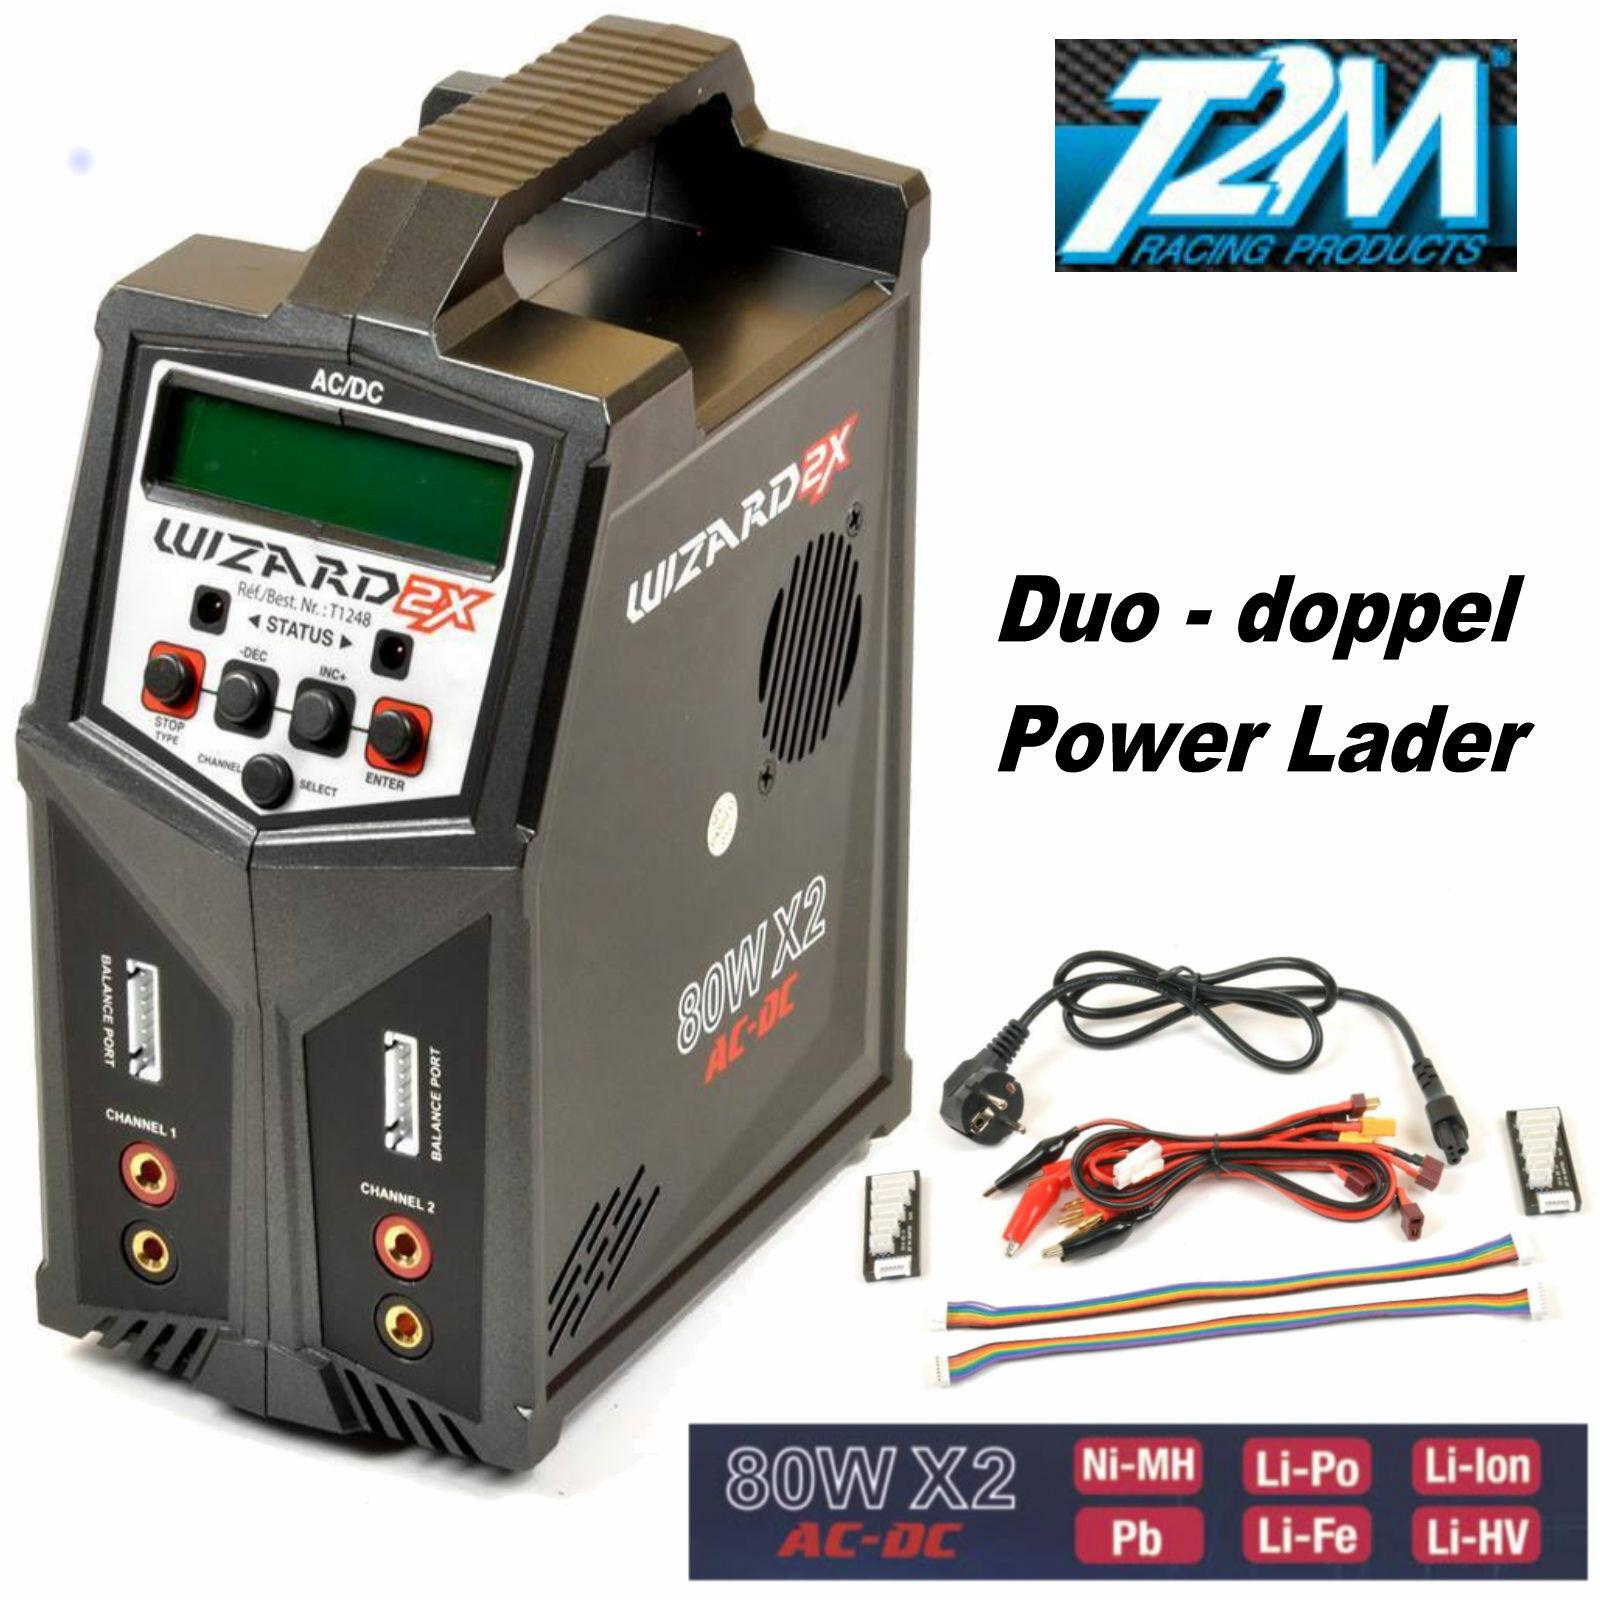 T2m Wizard x2 autoicabatteria energia 80  Duo t1248 AC-DC 2 x 80 Watt  il ORGINAL   fantastica qualità